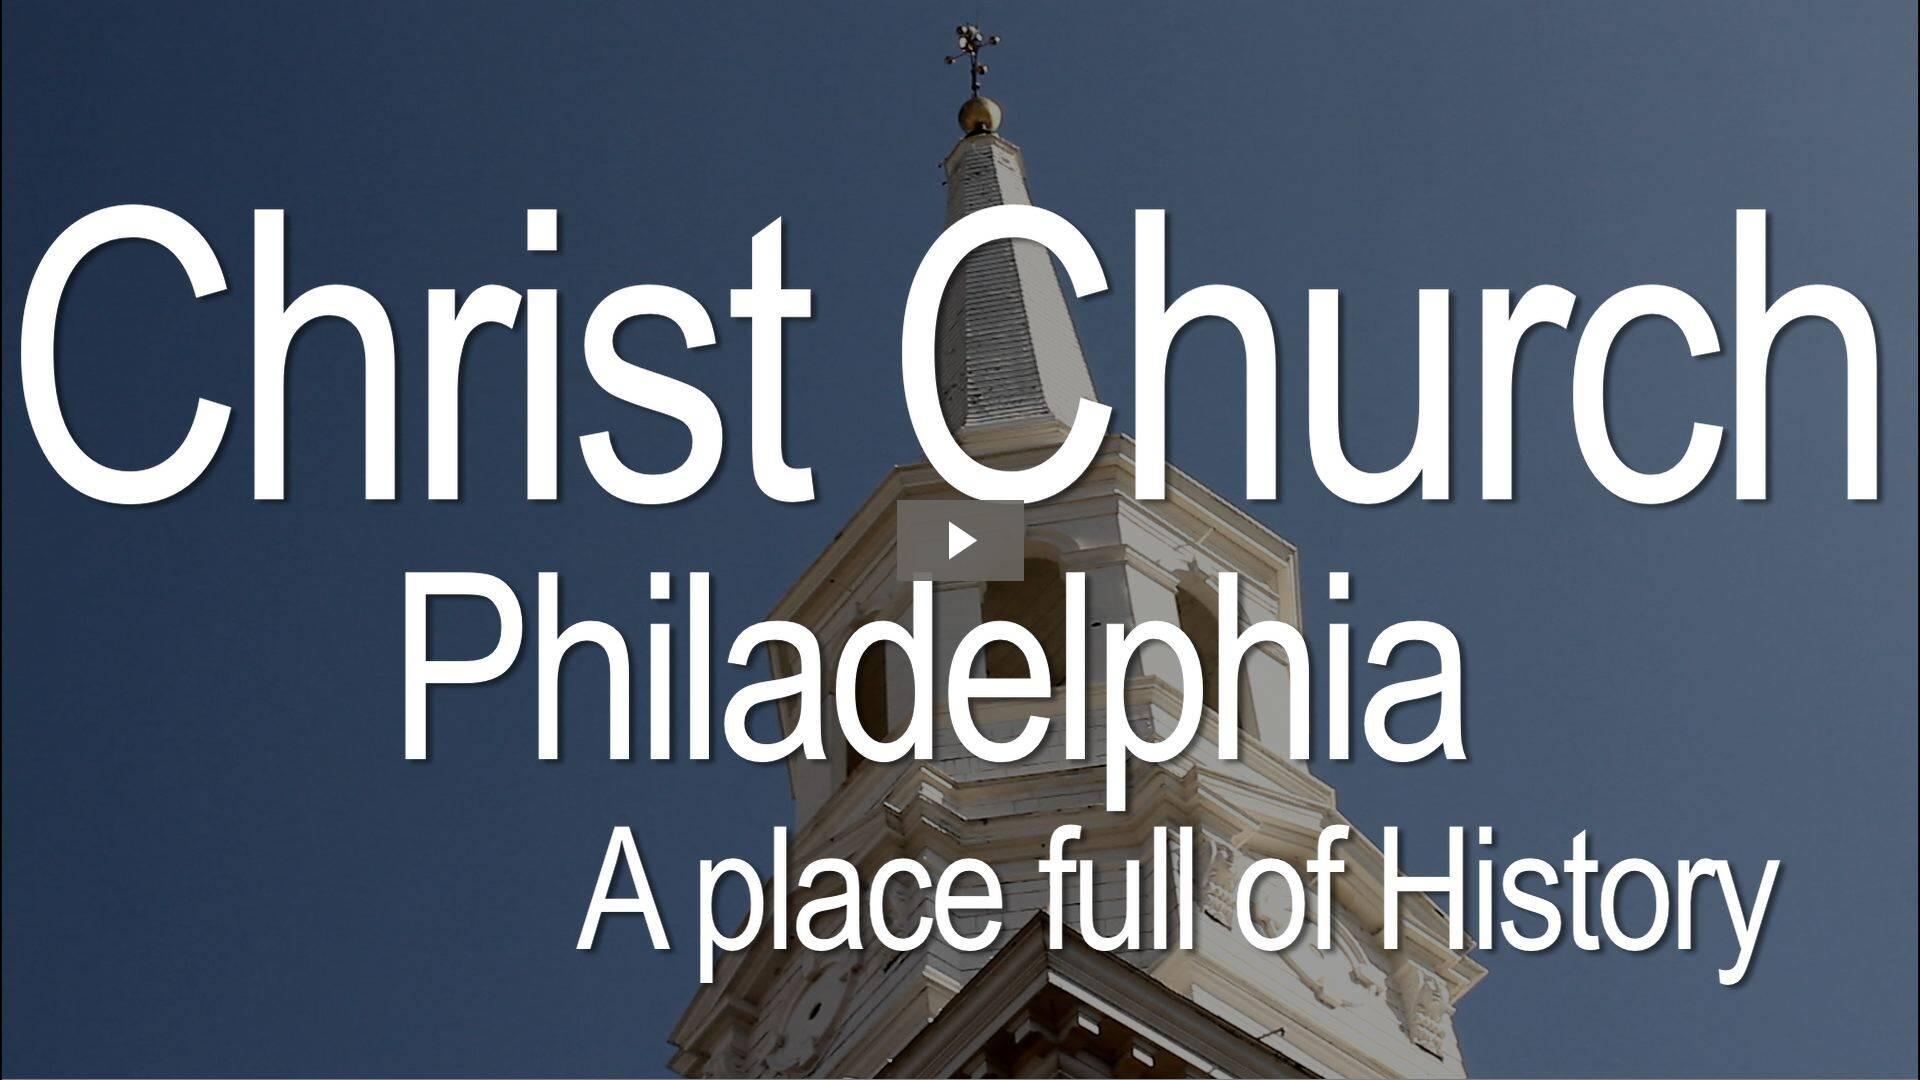 Transforming Churches - Christ Church Philadelphia